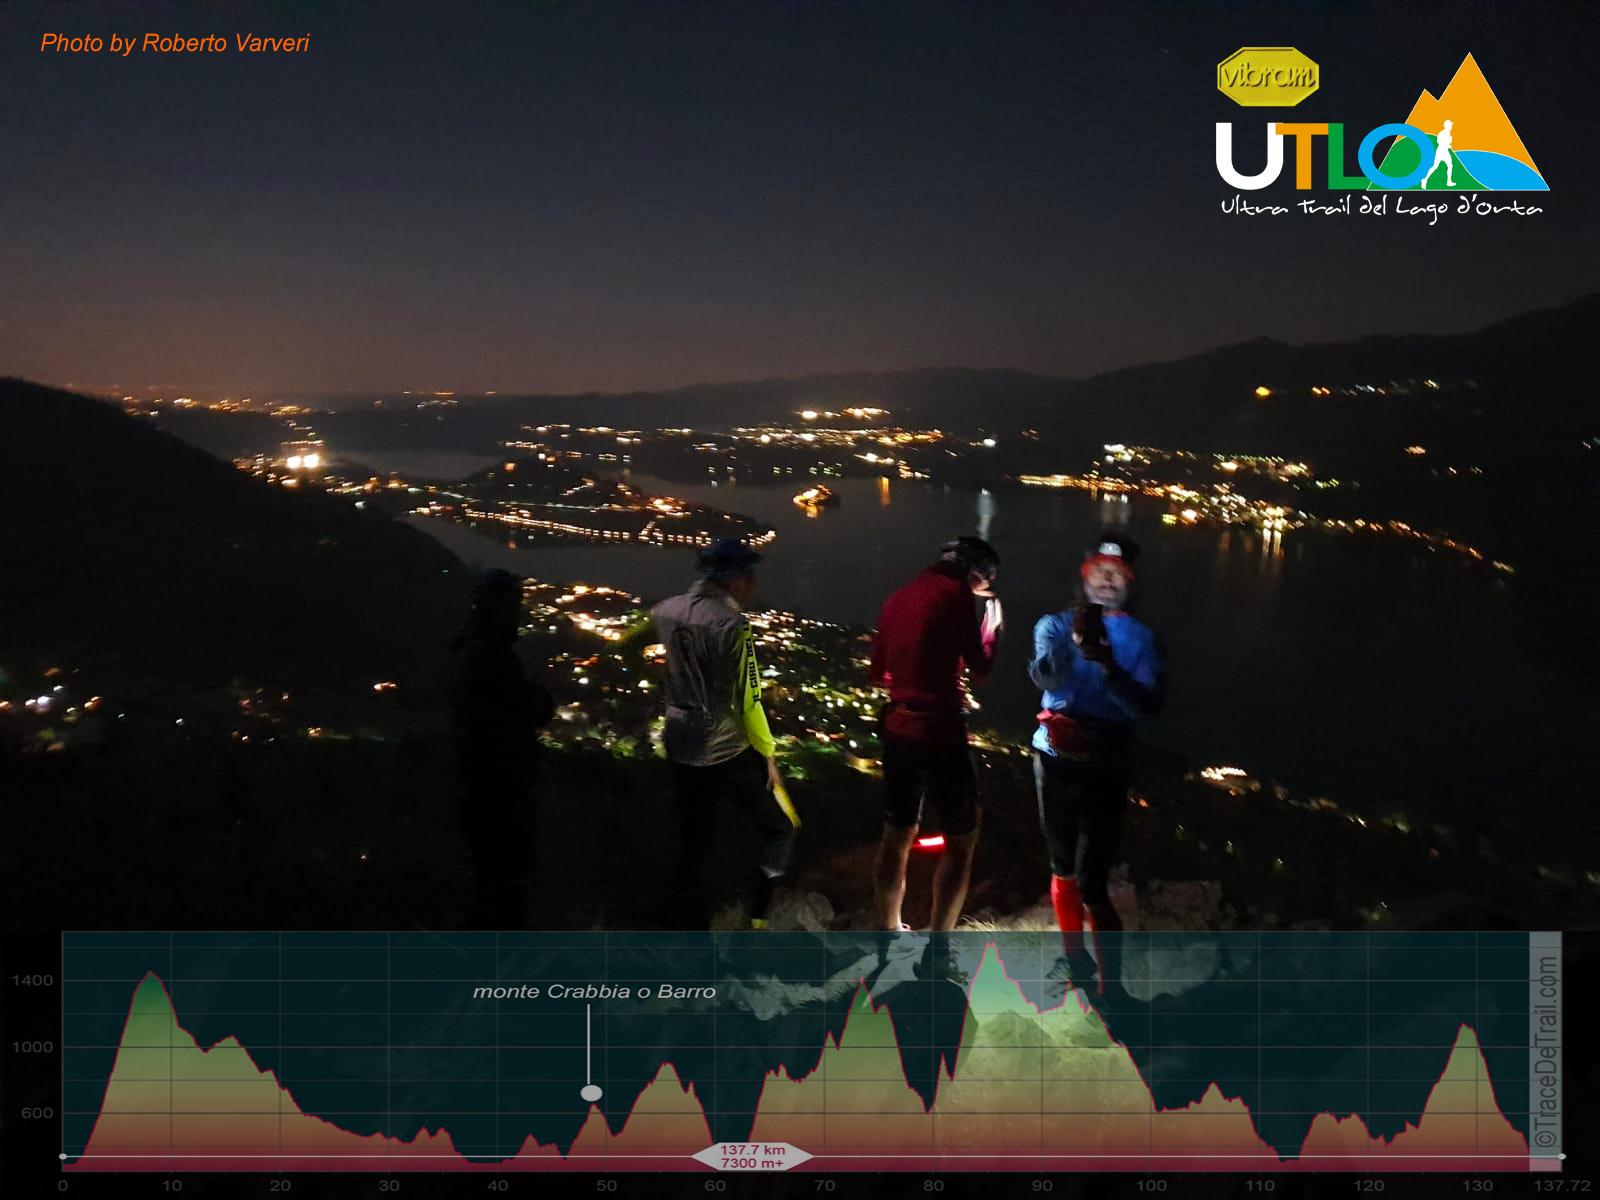 Breathtaking night views at the Vibram®UTLO 140km